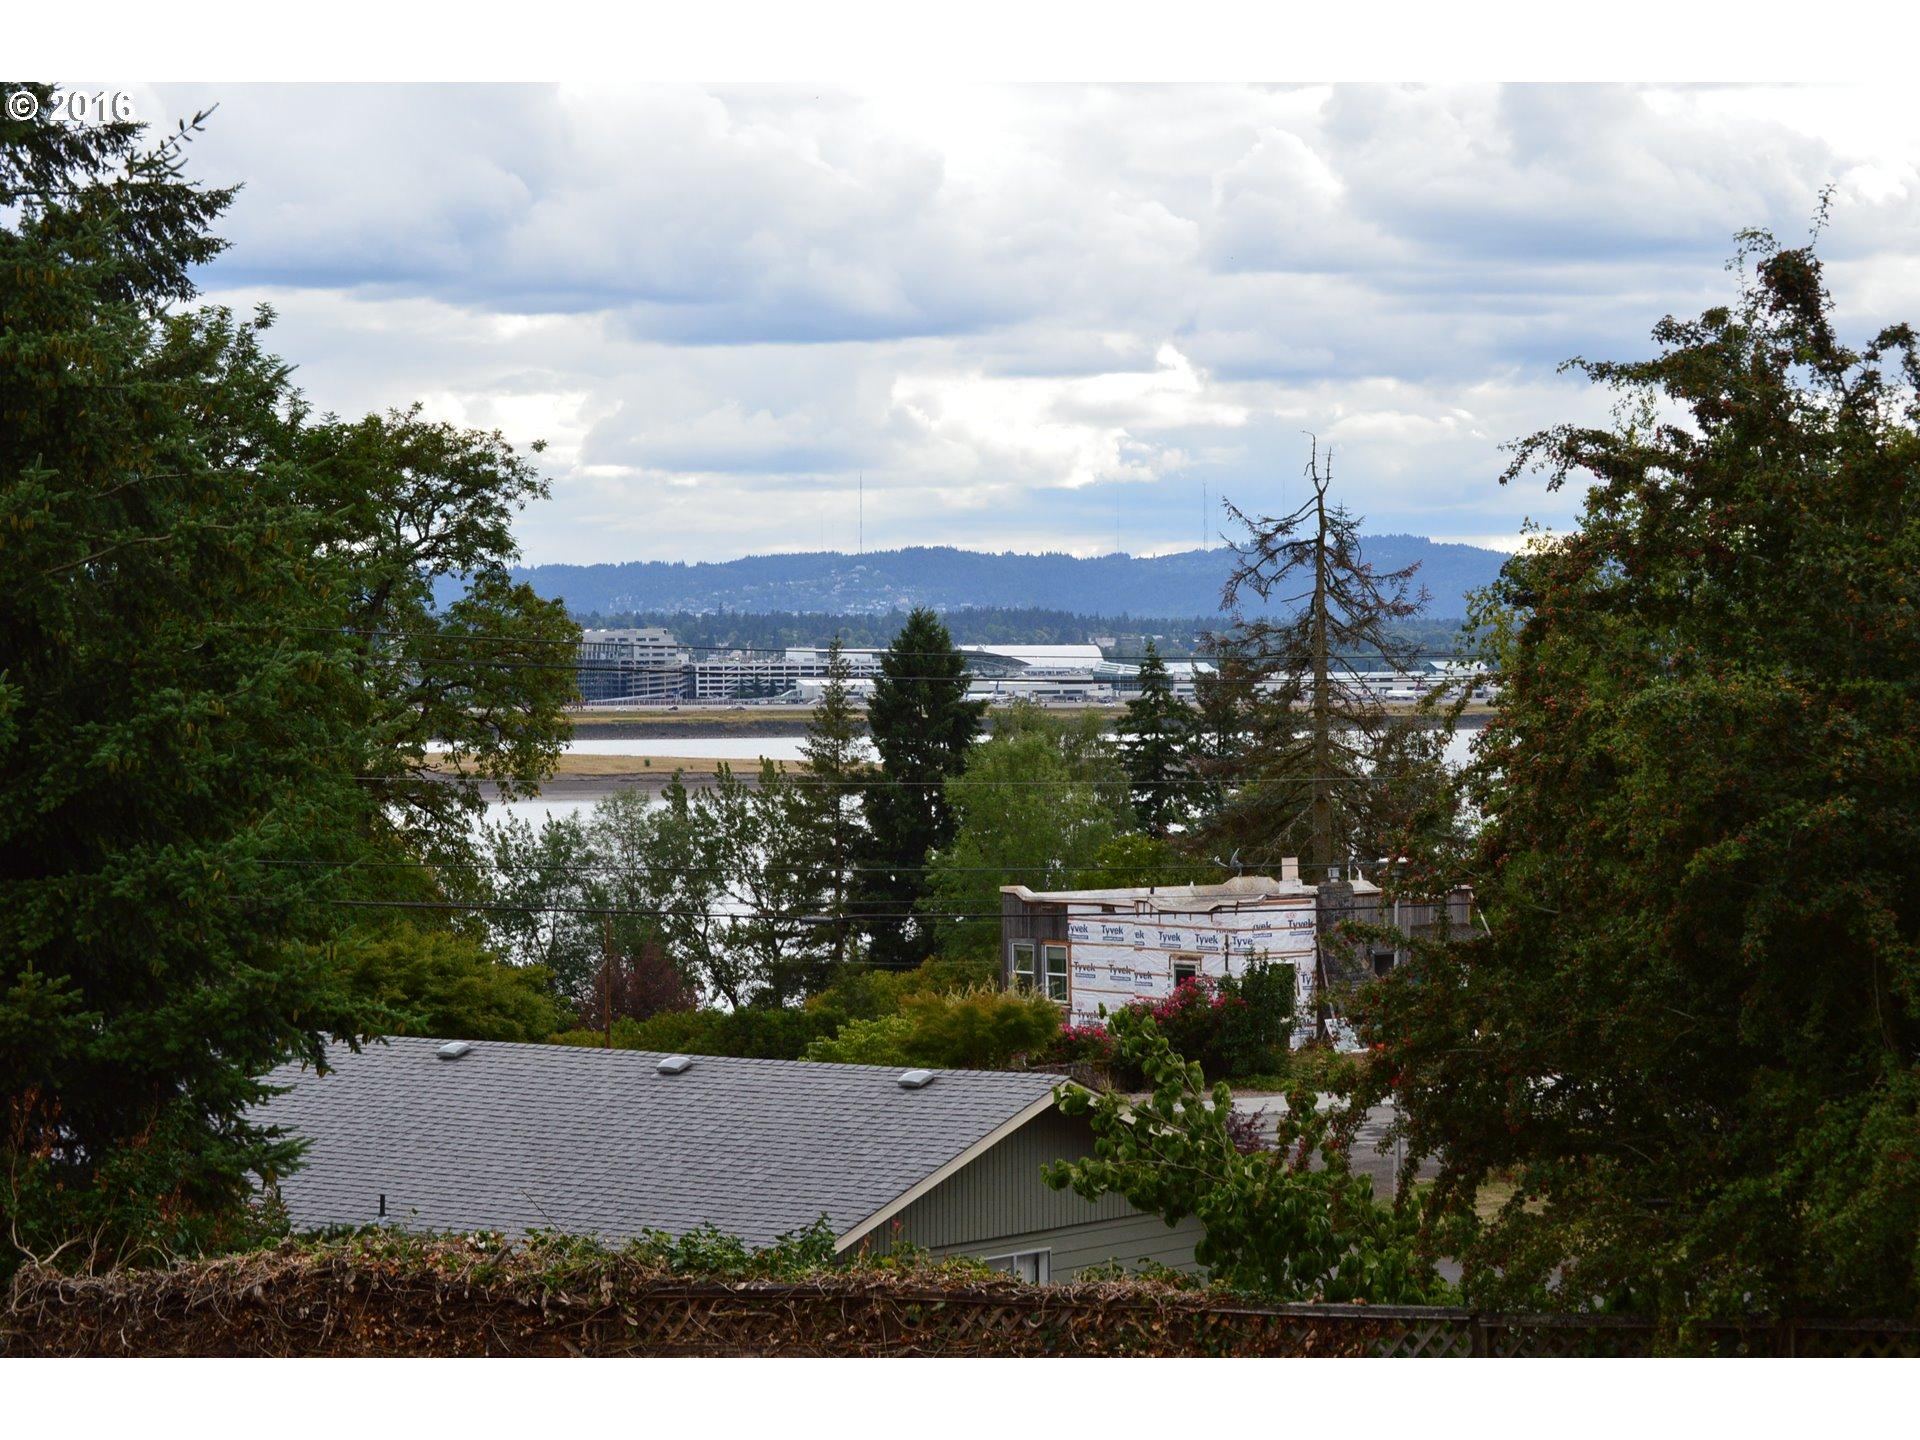 10706 Se Evergreen Hwy , Vancouver, WA - USA (photo 3)